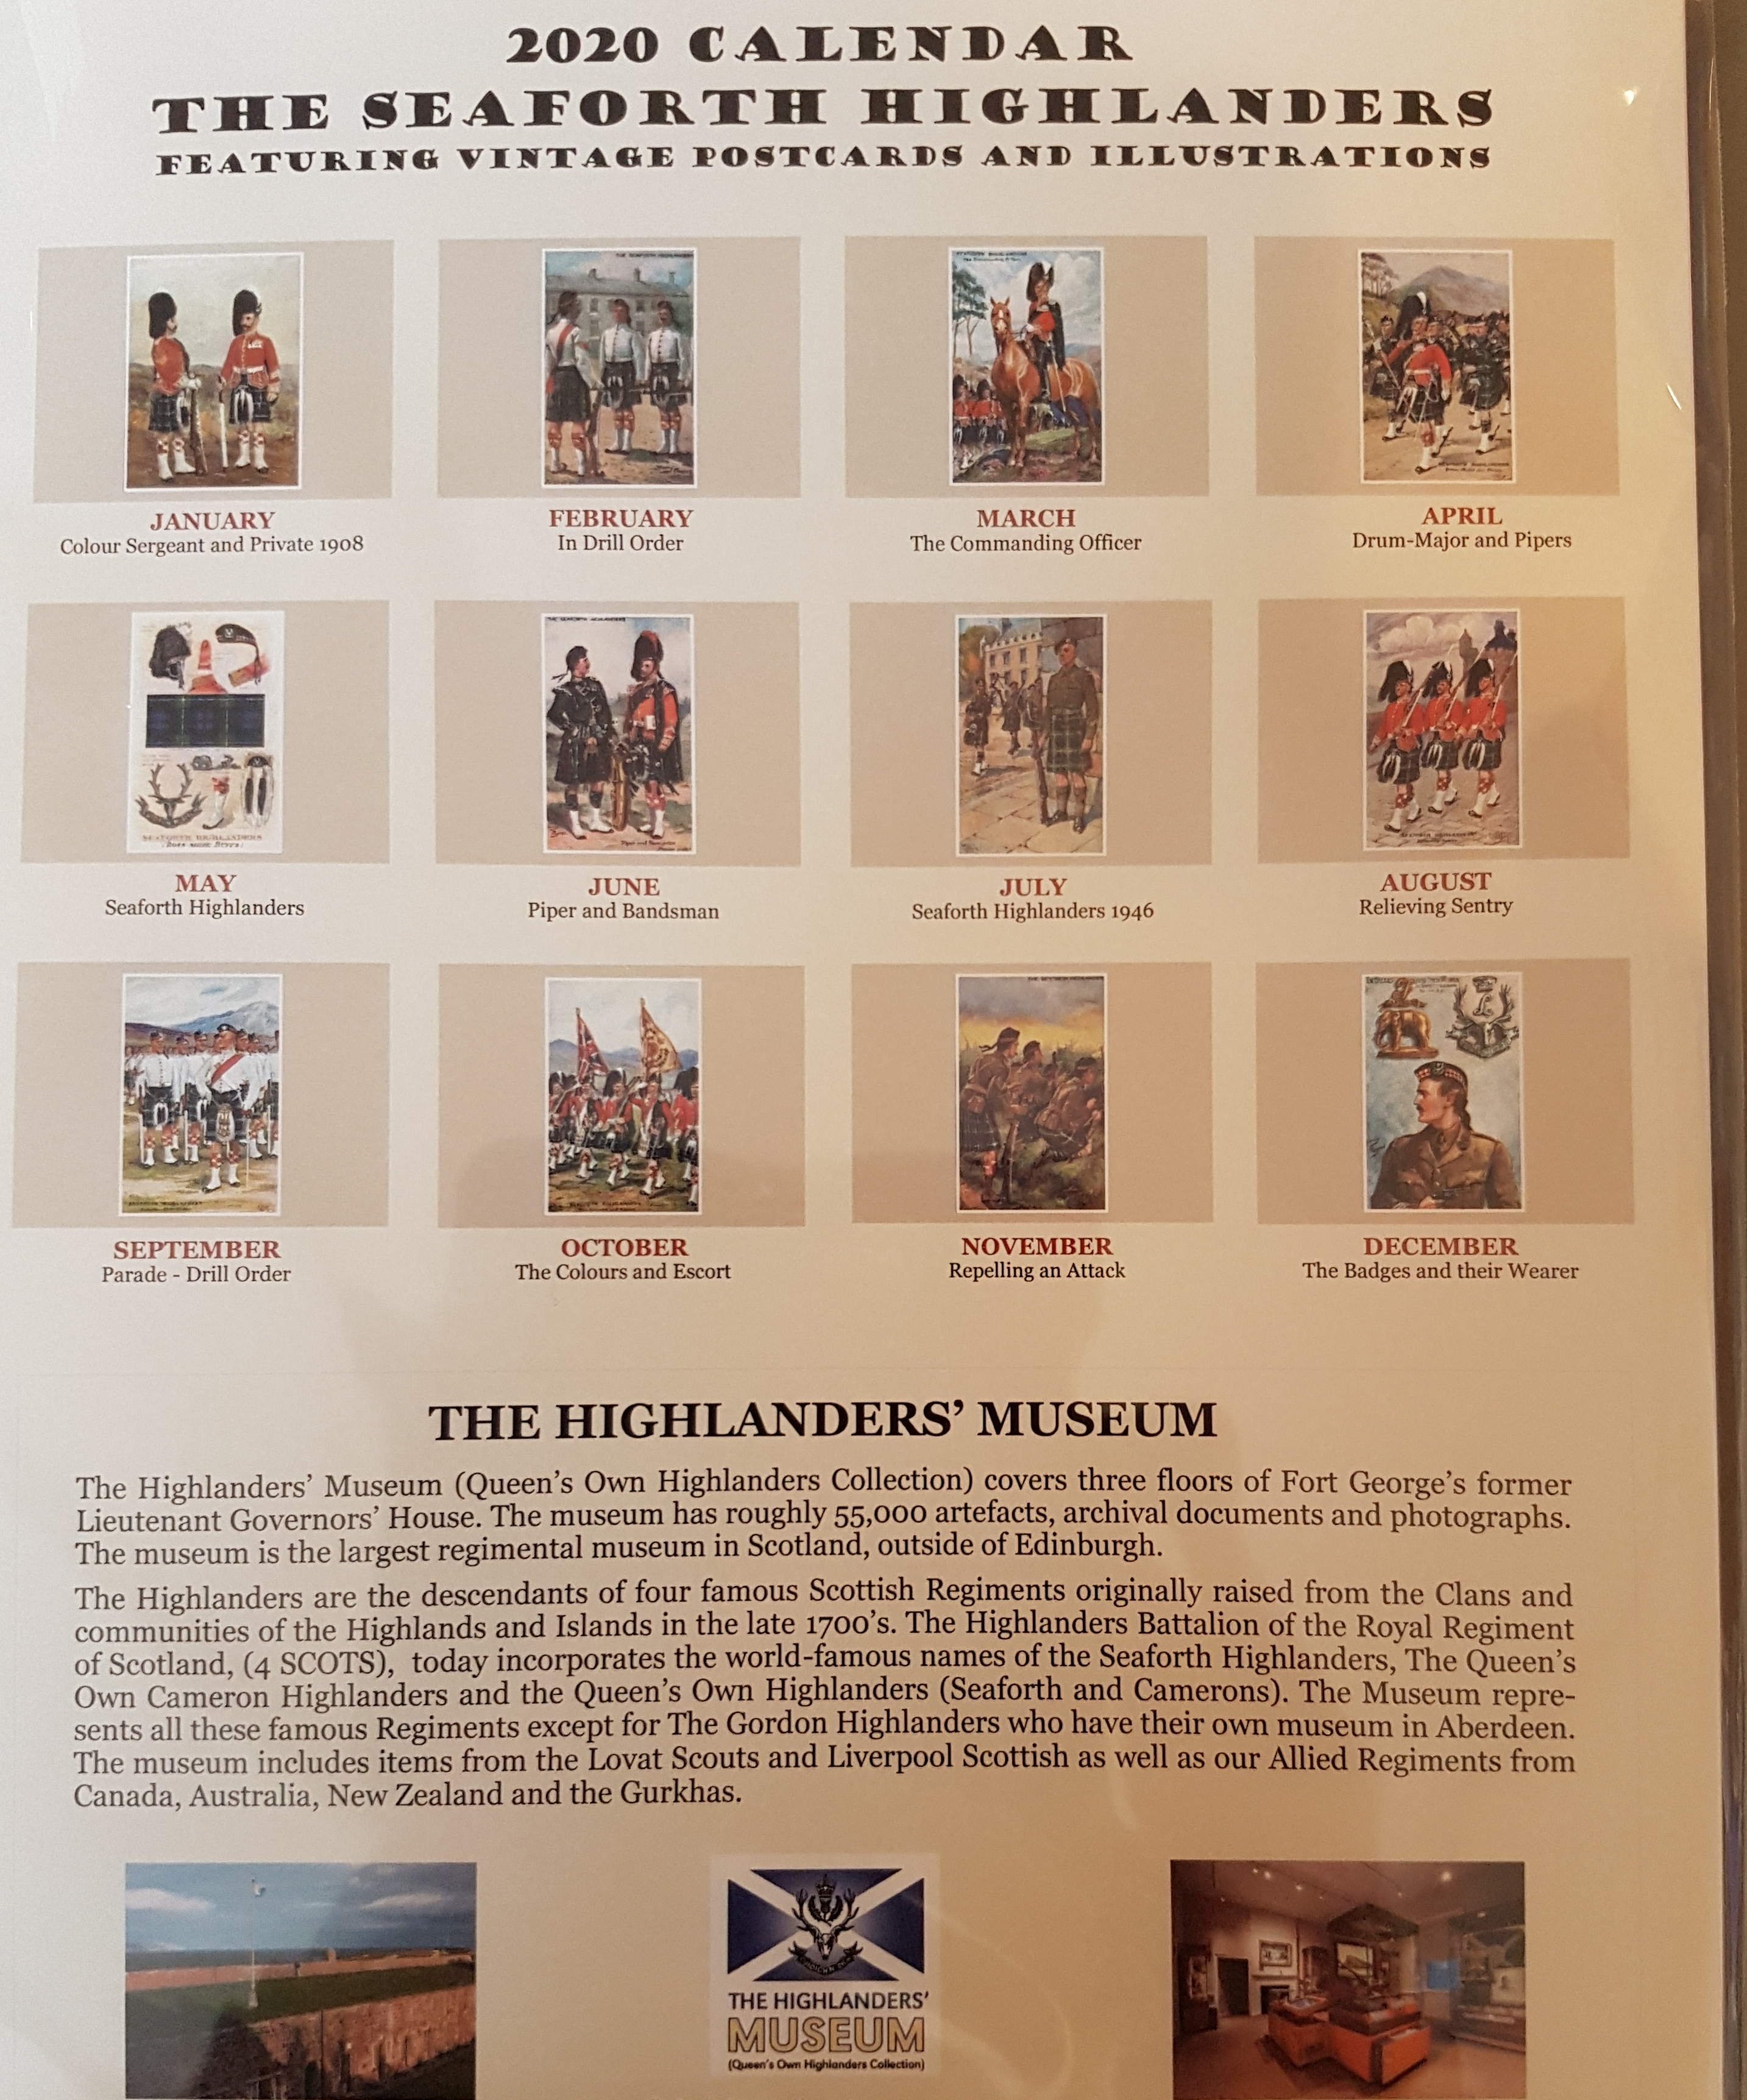 The Seaforth Highlanders 2020 Calendar